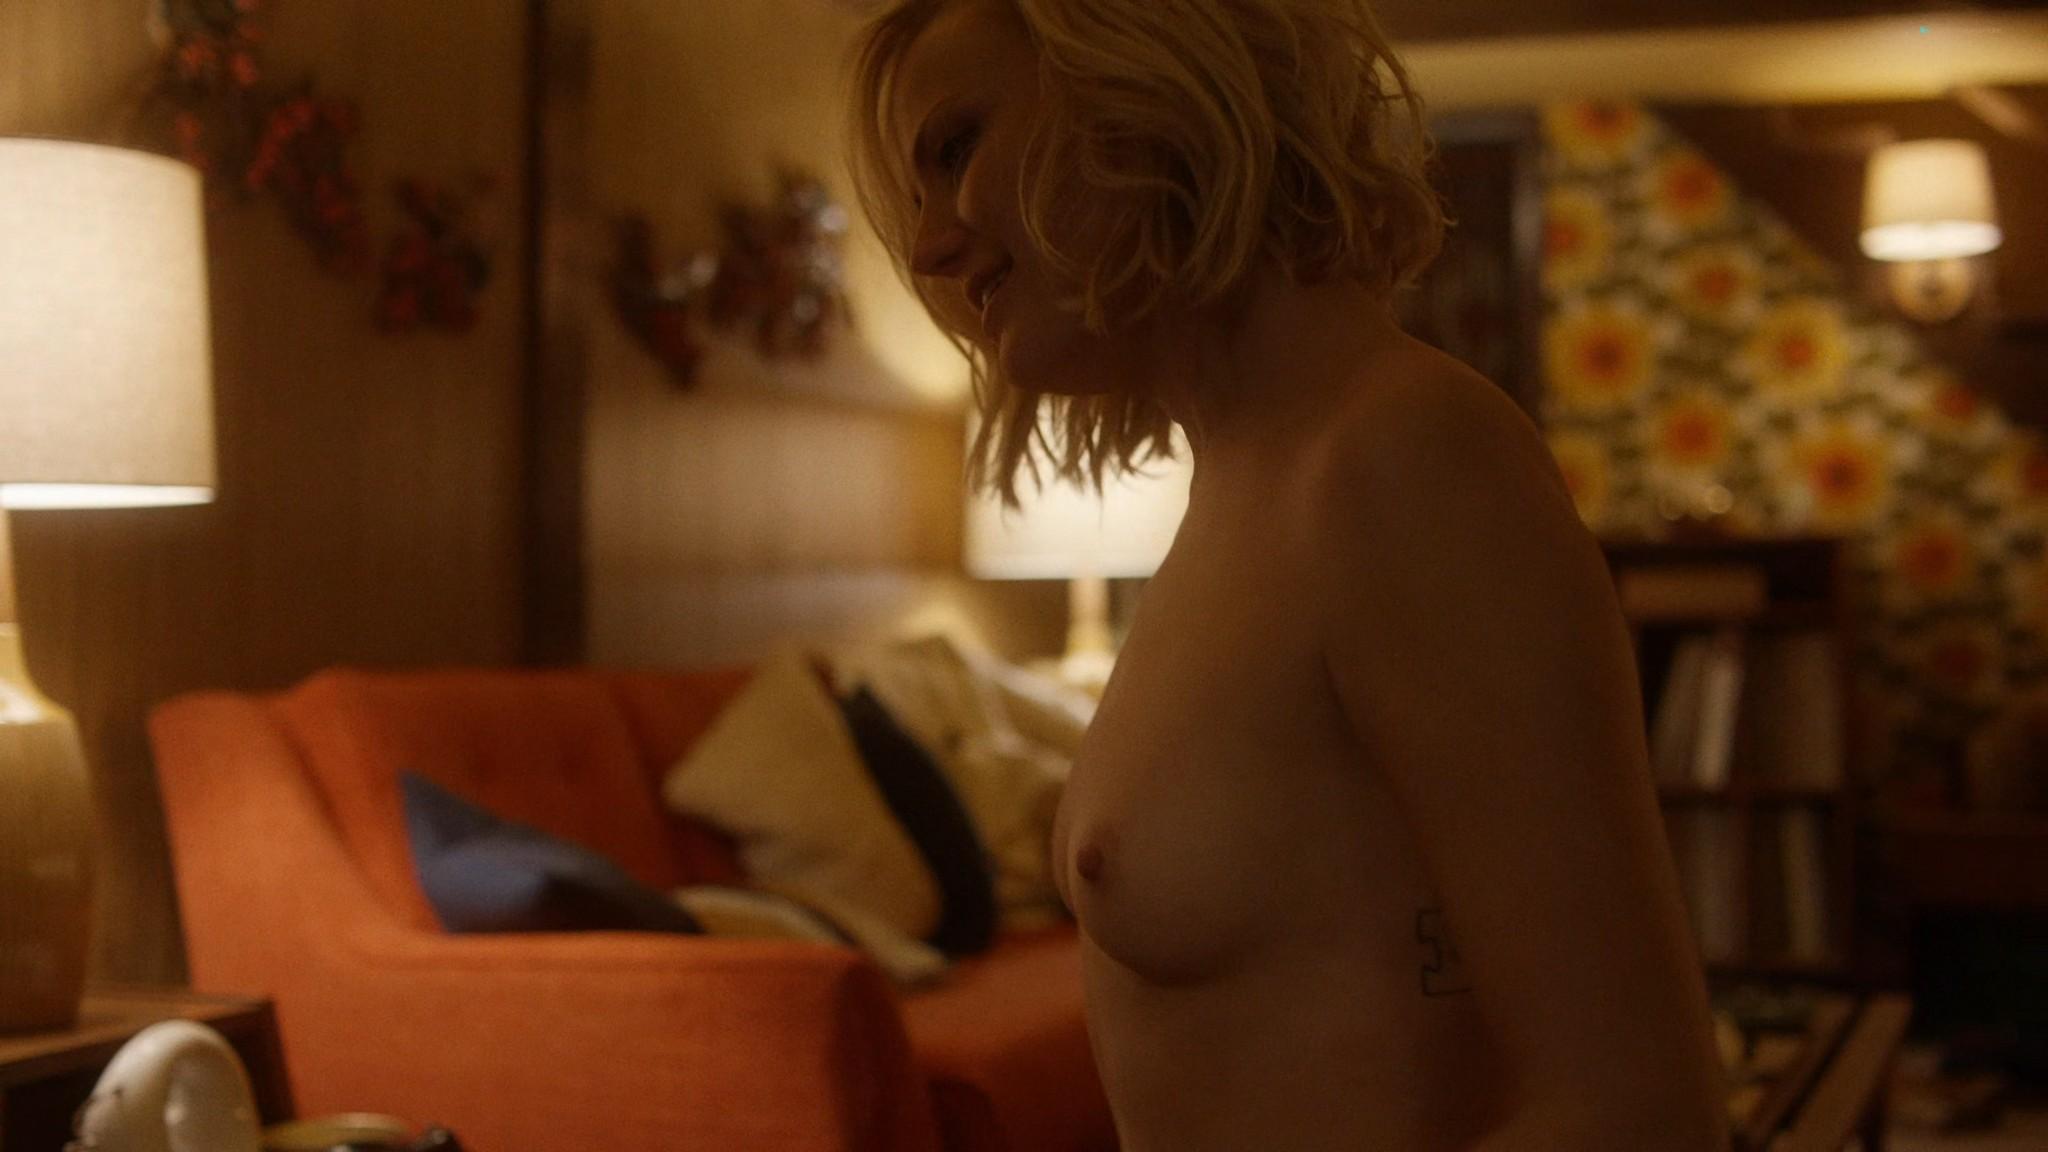 Malin Akerman nude sex threesome with Kate Micucci Easy 2016 s1e6 UHD 2160 1080p 008